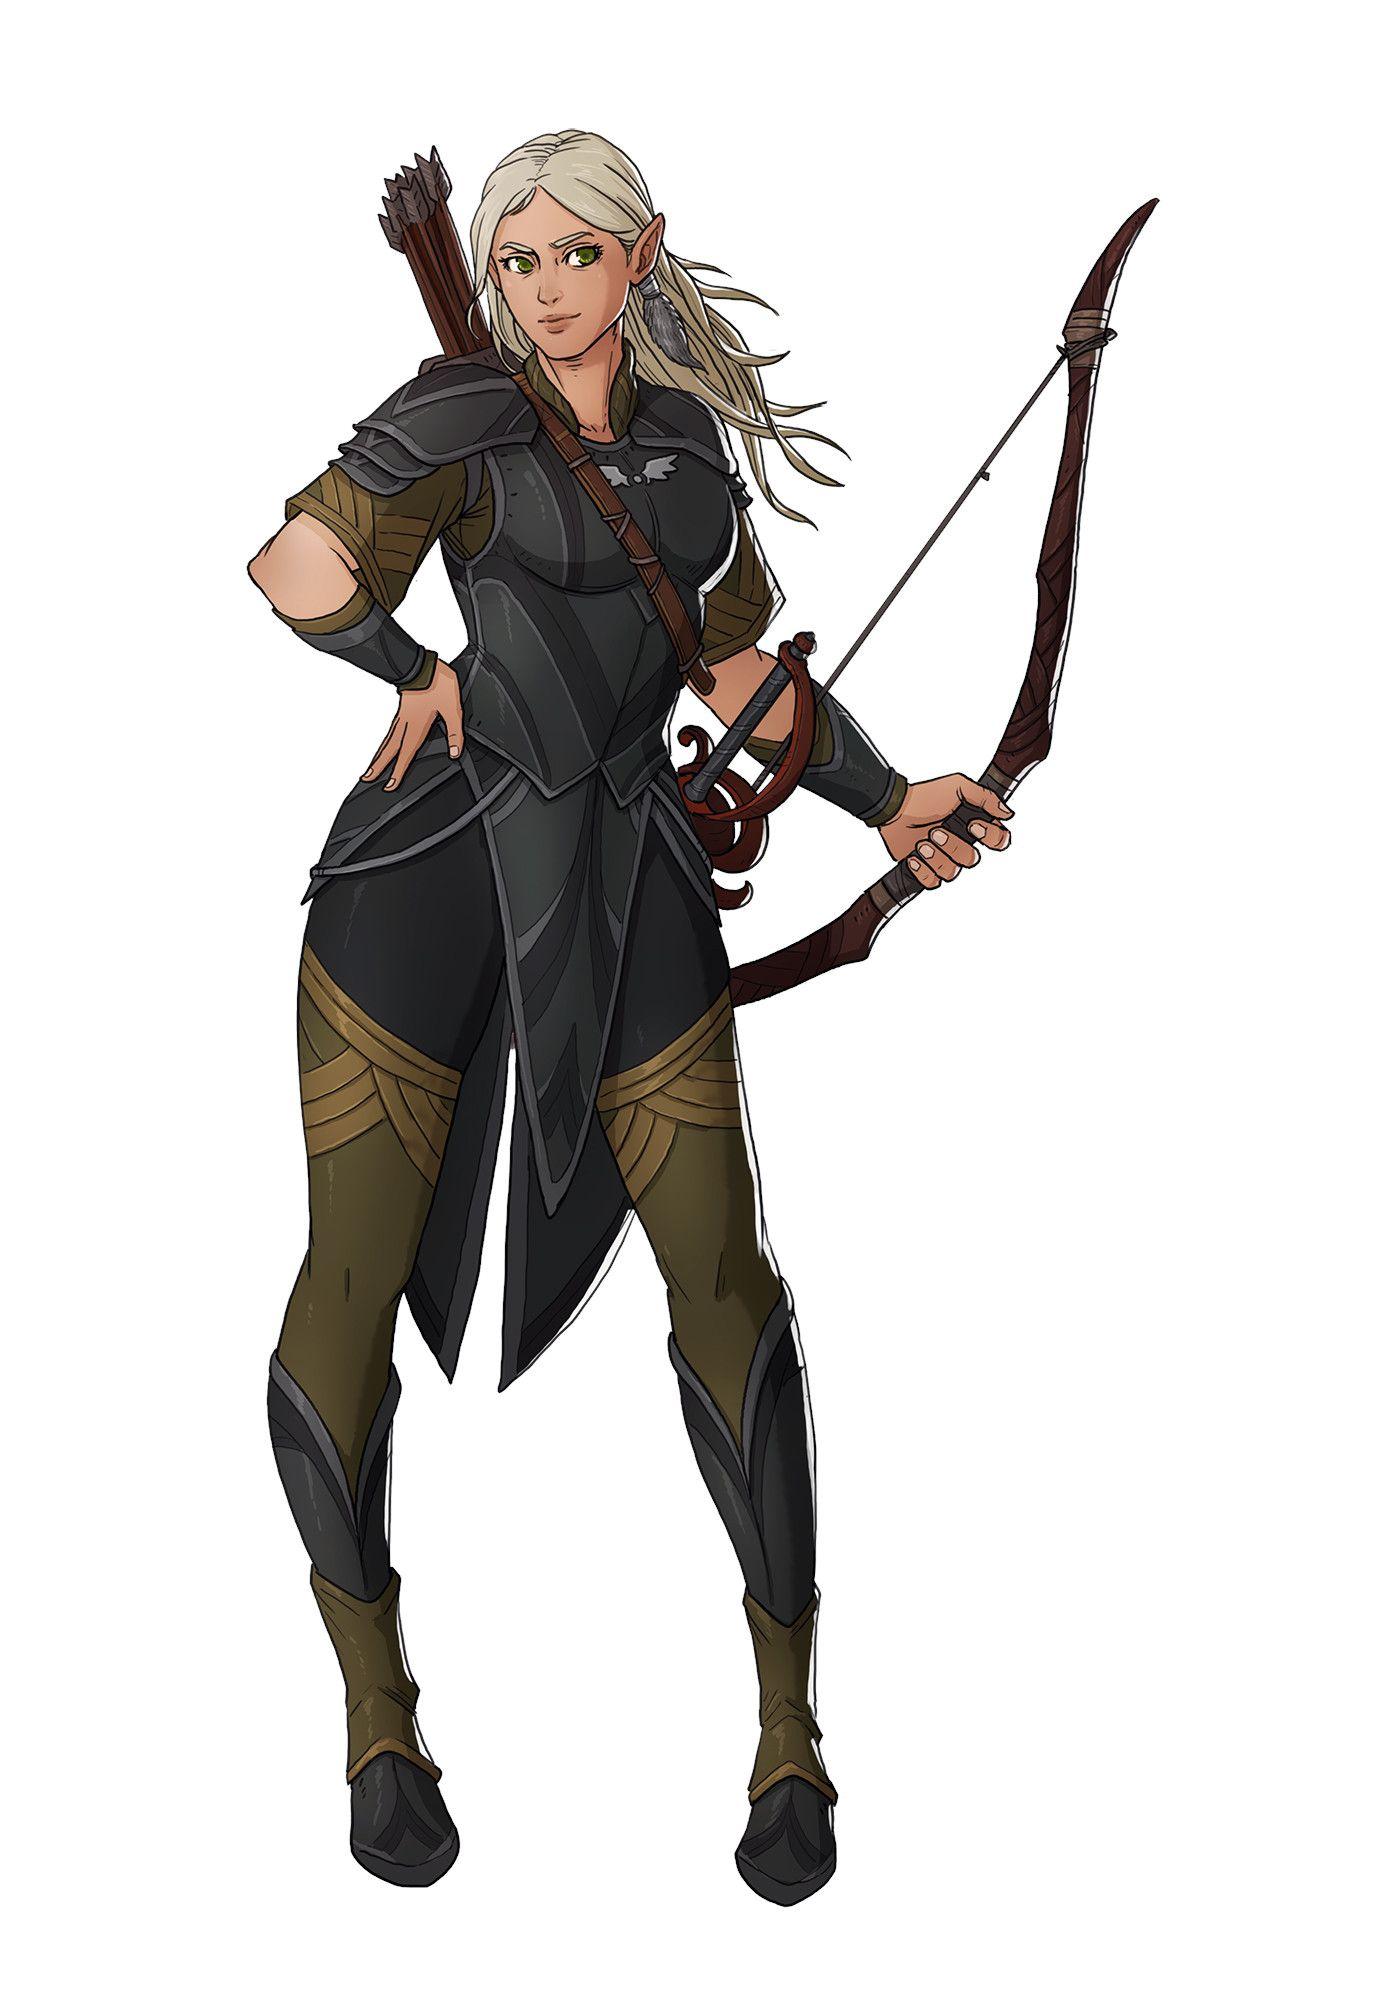 ArtStation - RPG Character Set 09, Ernesto Irawan